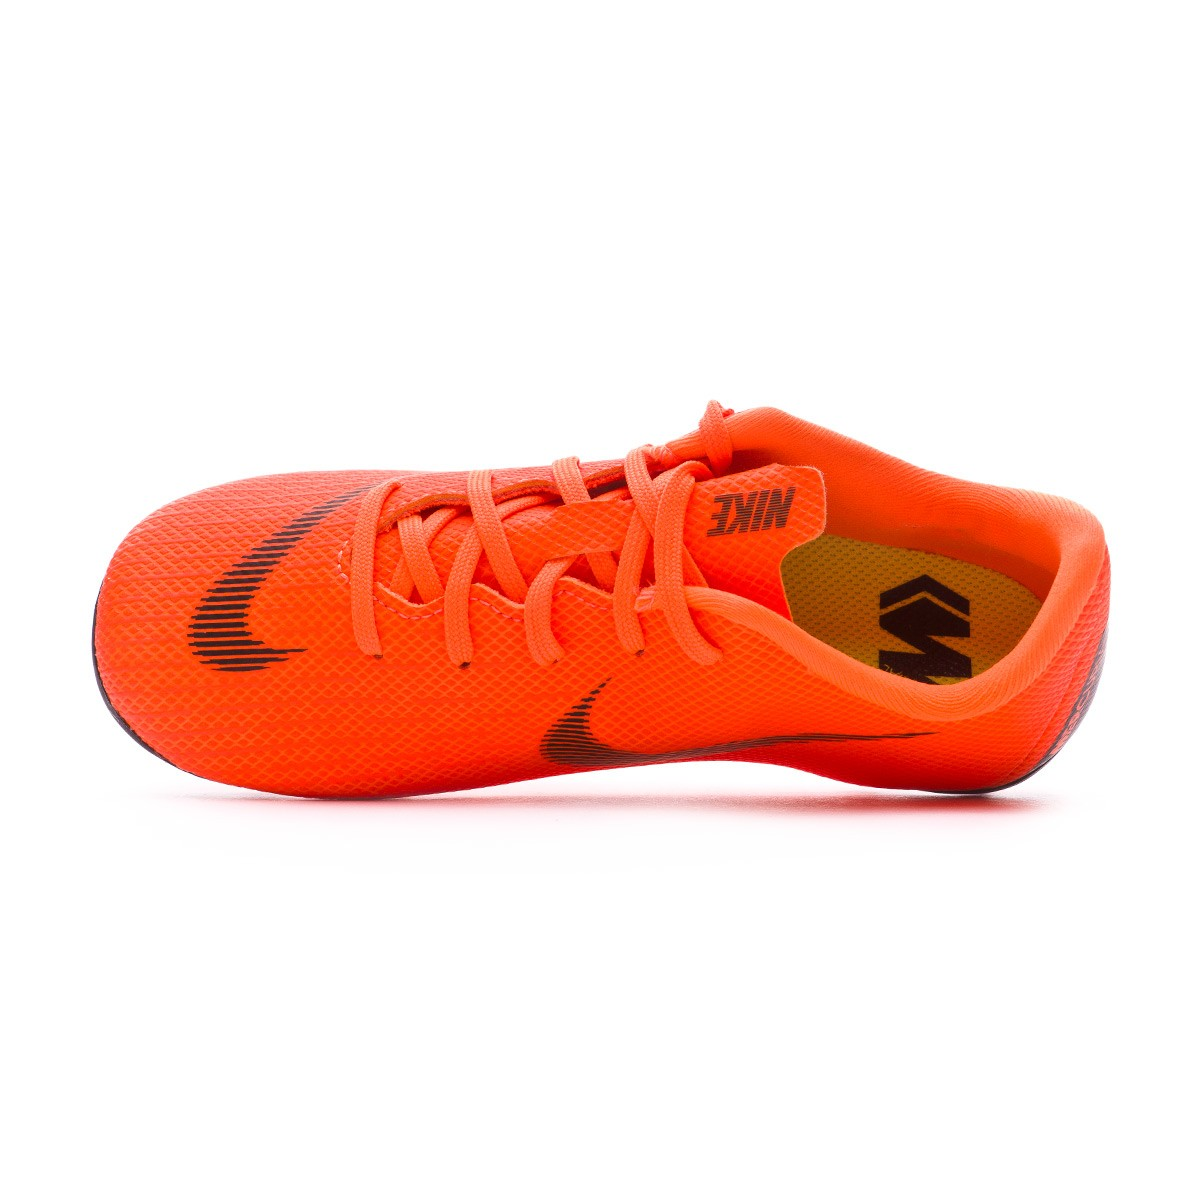 2962ea85317b Football Boots Nike Kids Mercurial Vapor XII Academy PS MG Total  orange-Black-Volt - Tienda de fútbol Fútbol Emotion